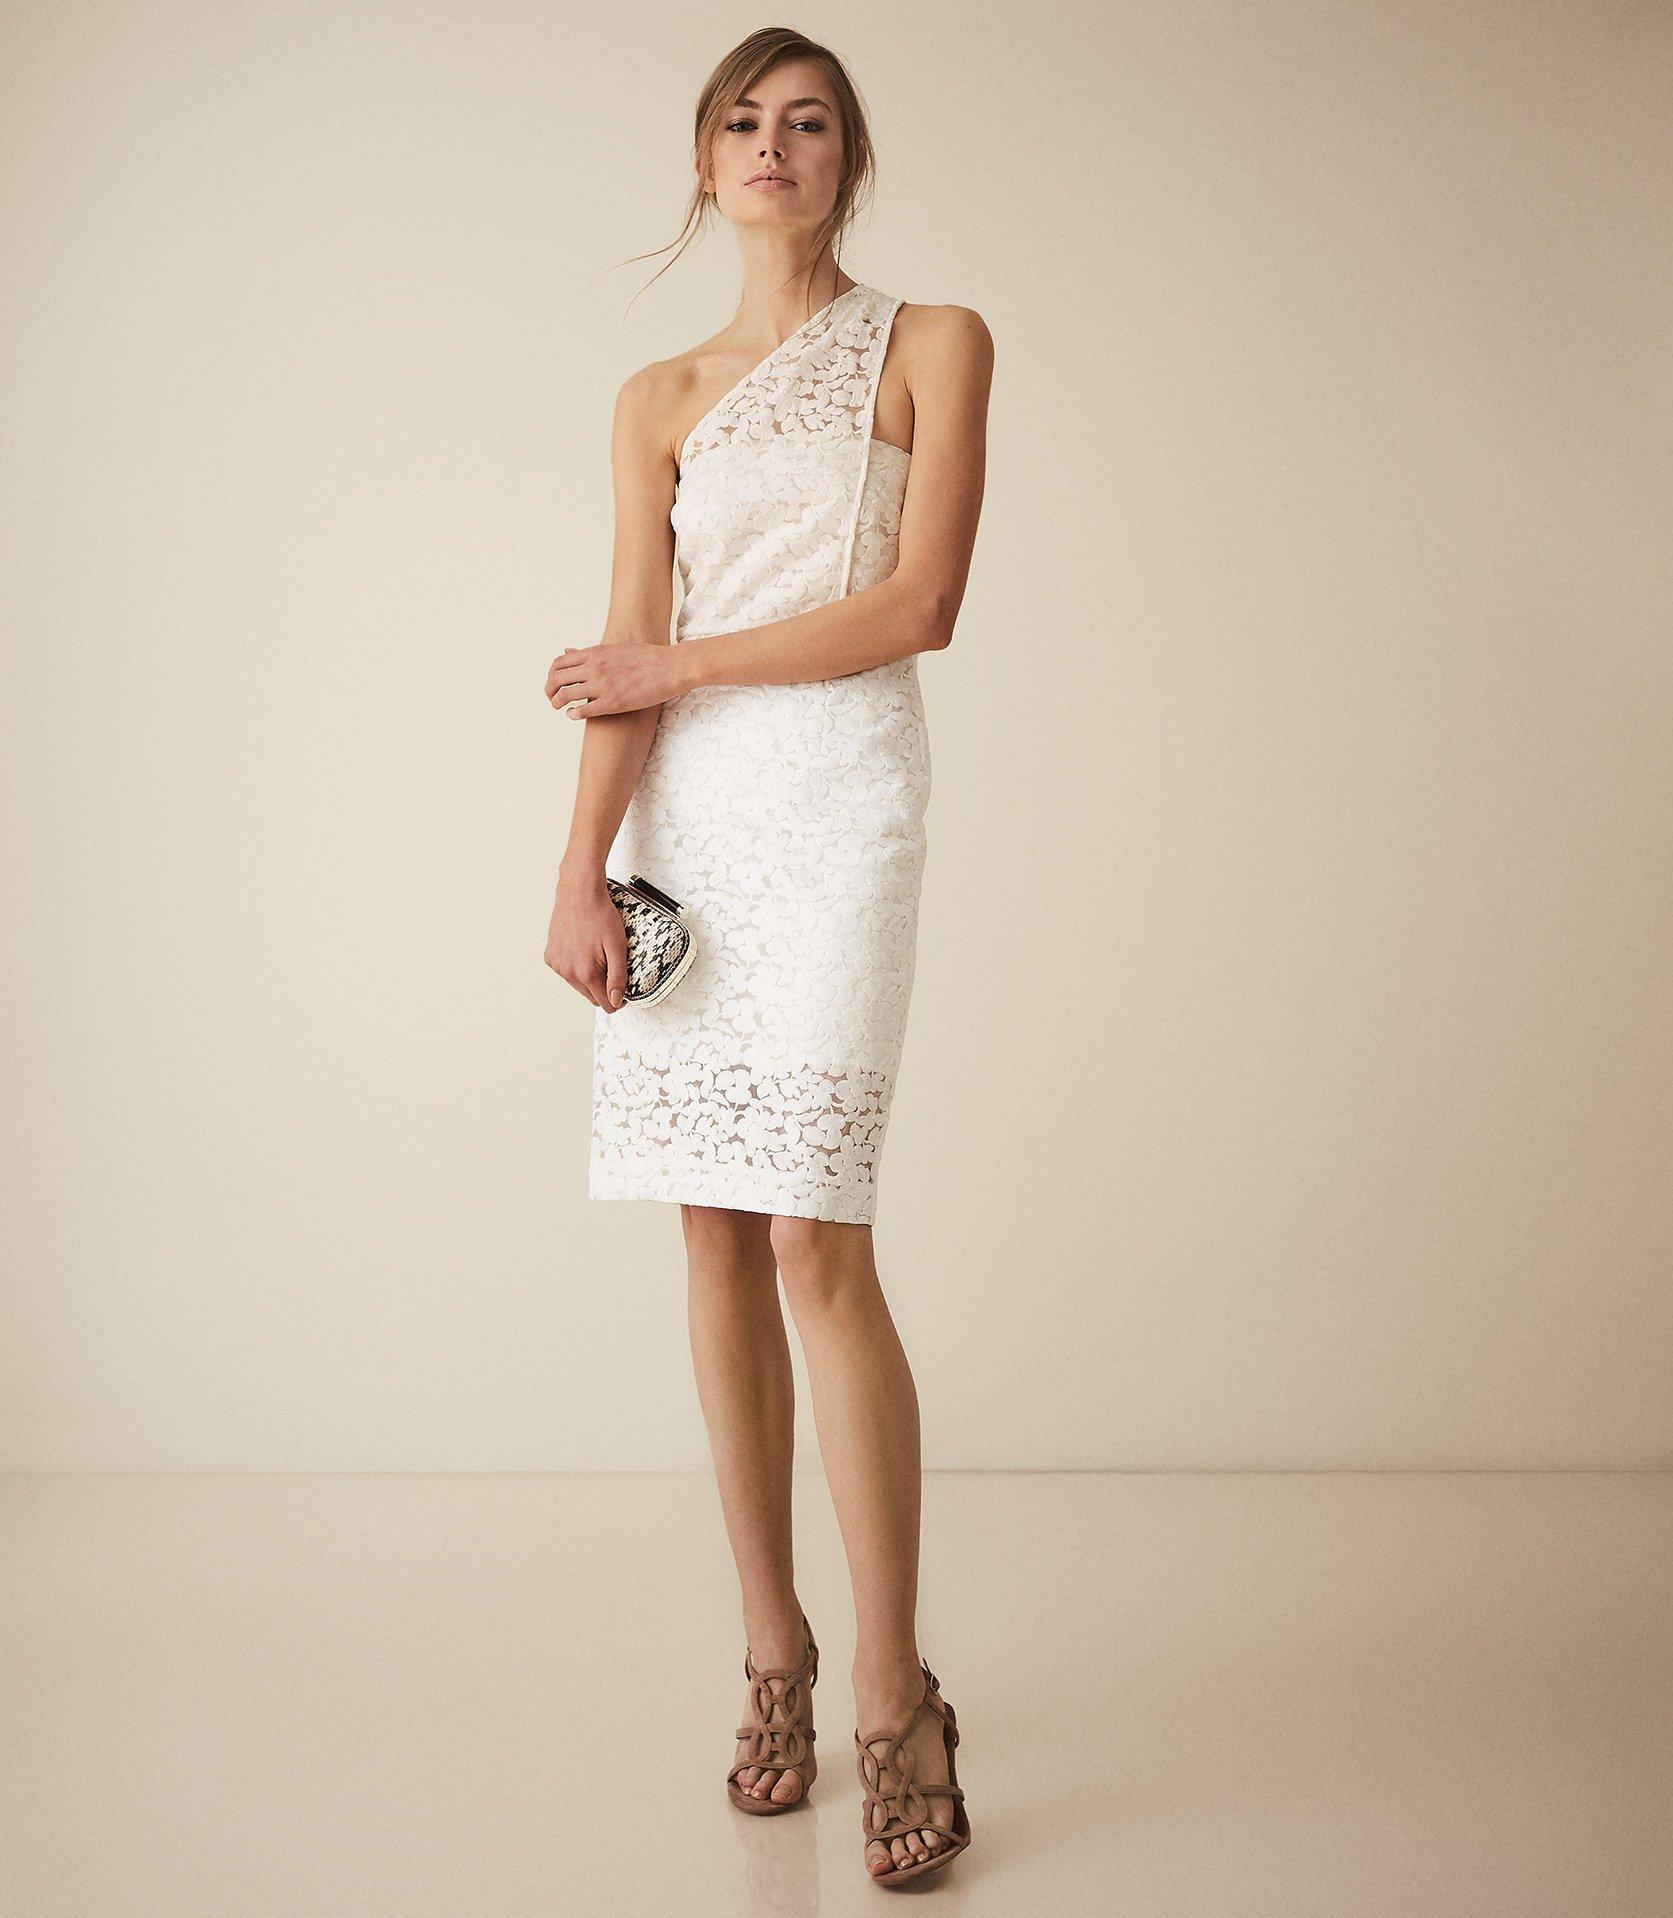 6331a88d27f30 Lyst - Reiss Sophia - One Shoulder Lace Dress in White